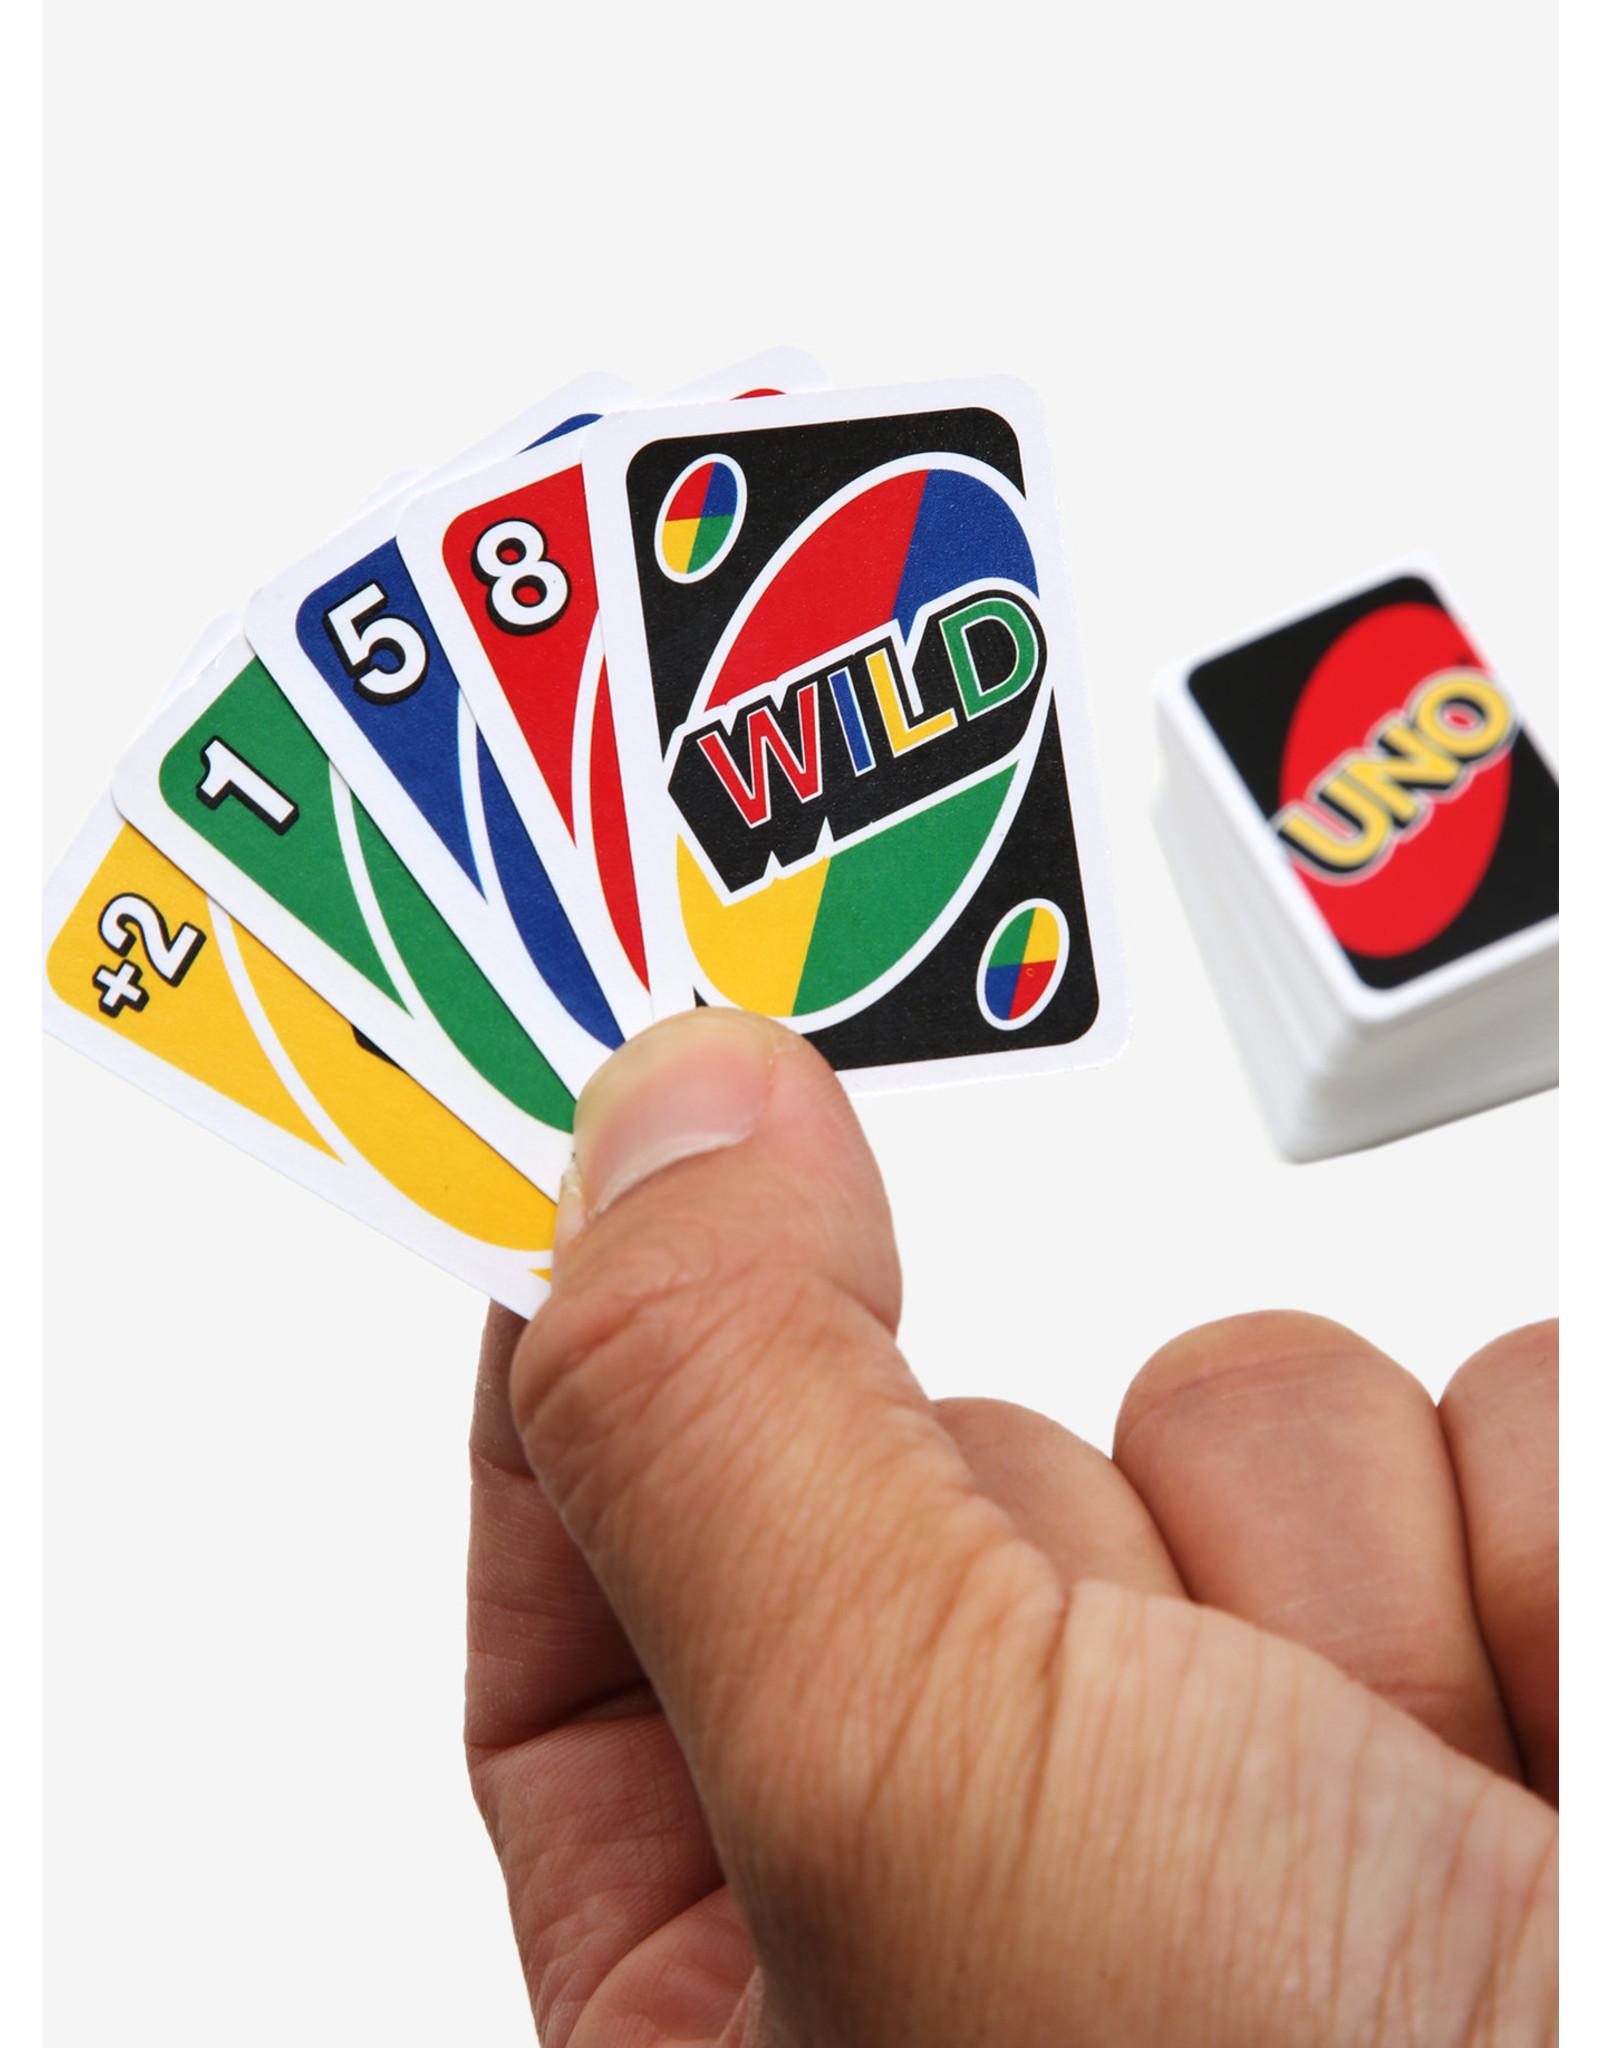 World's Smallest World's Smallest UNO Game